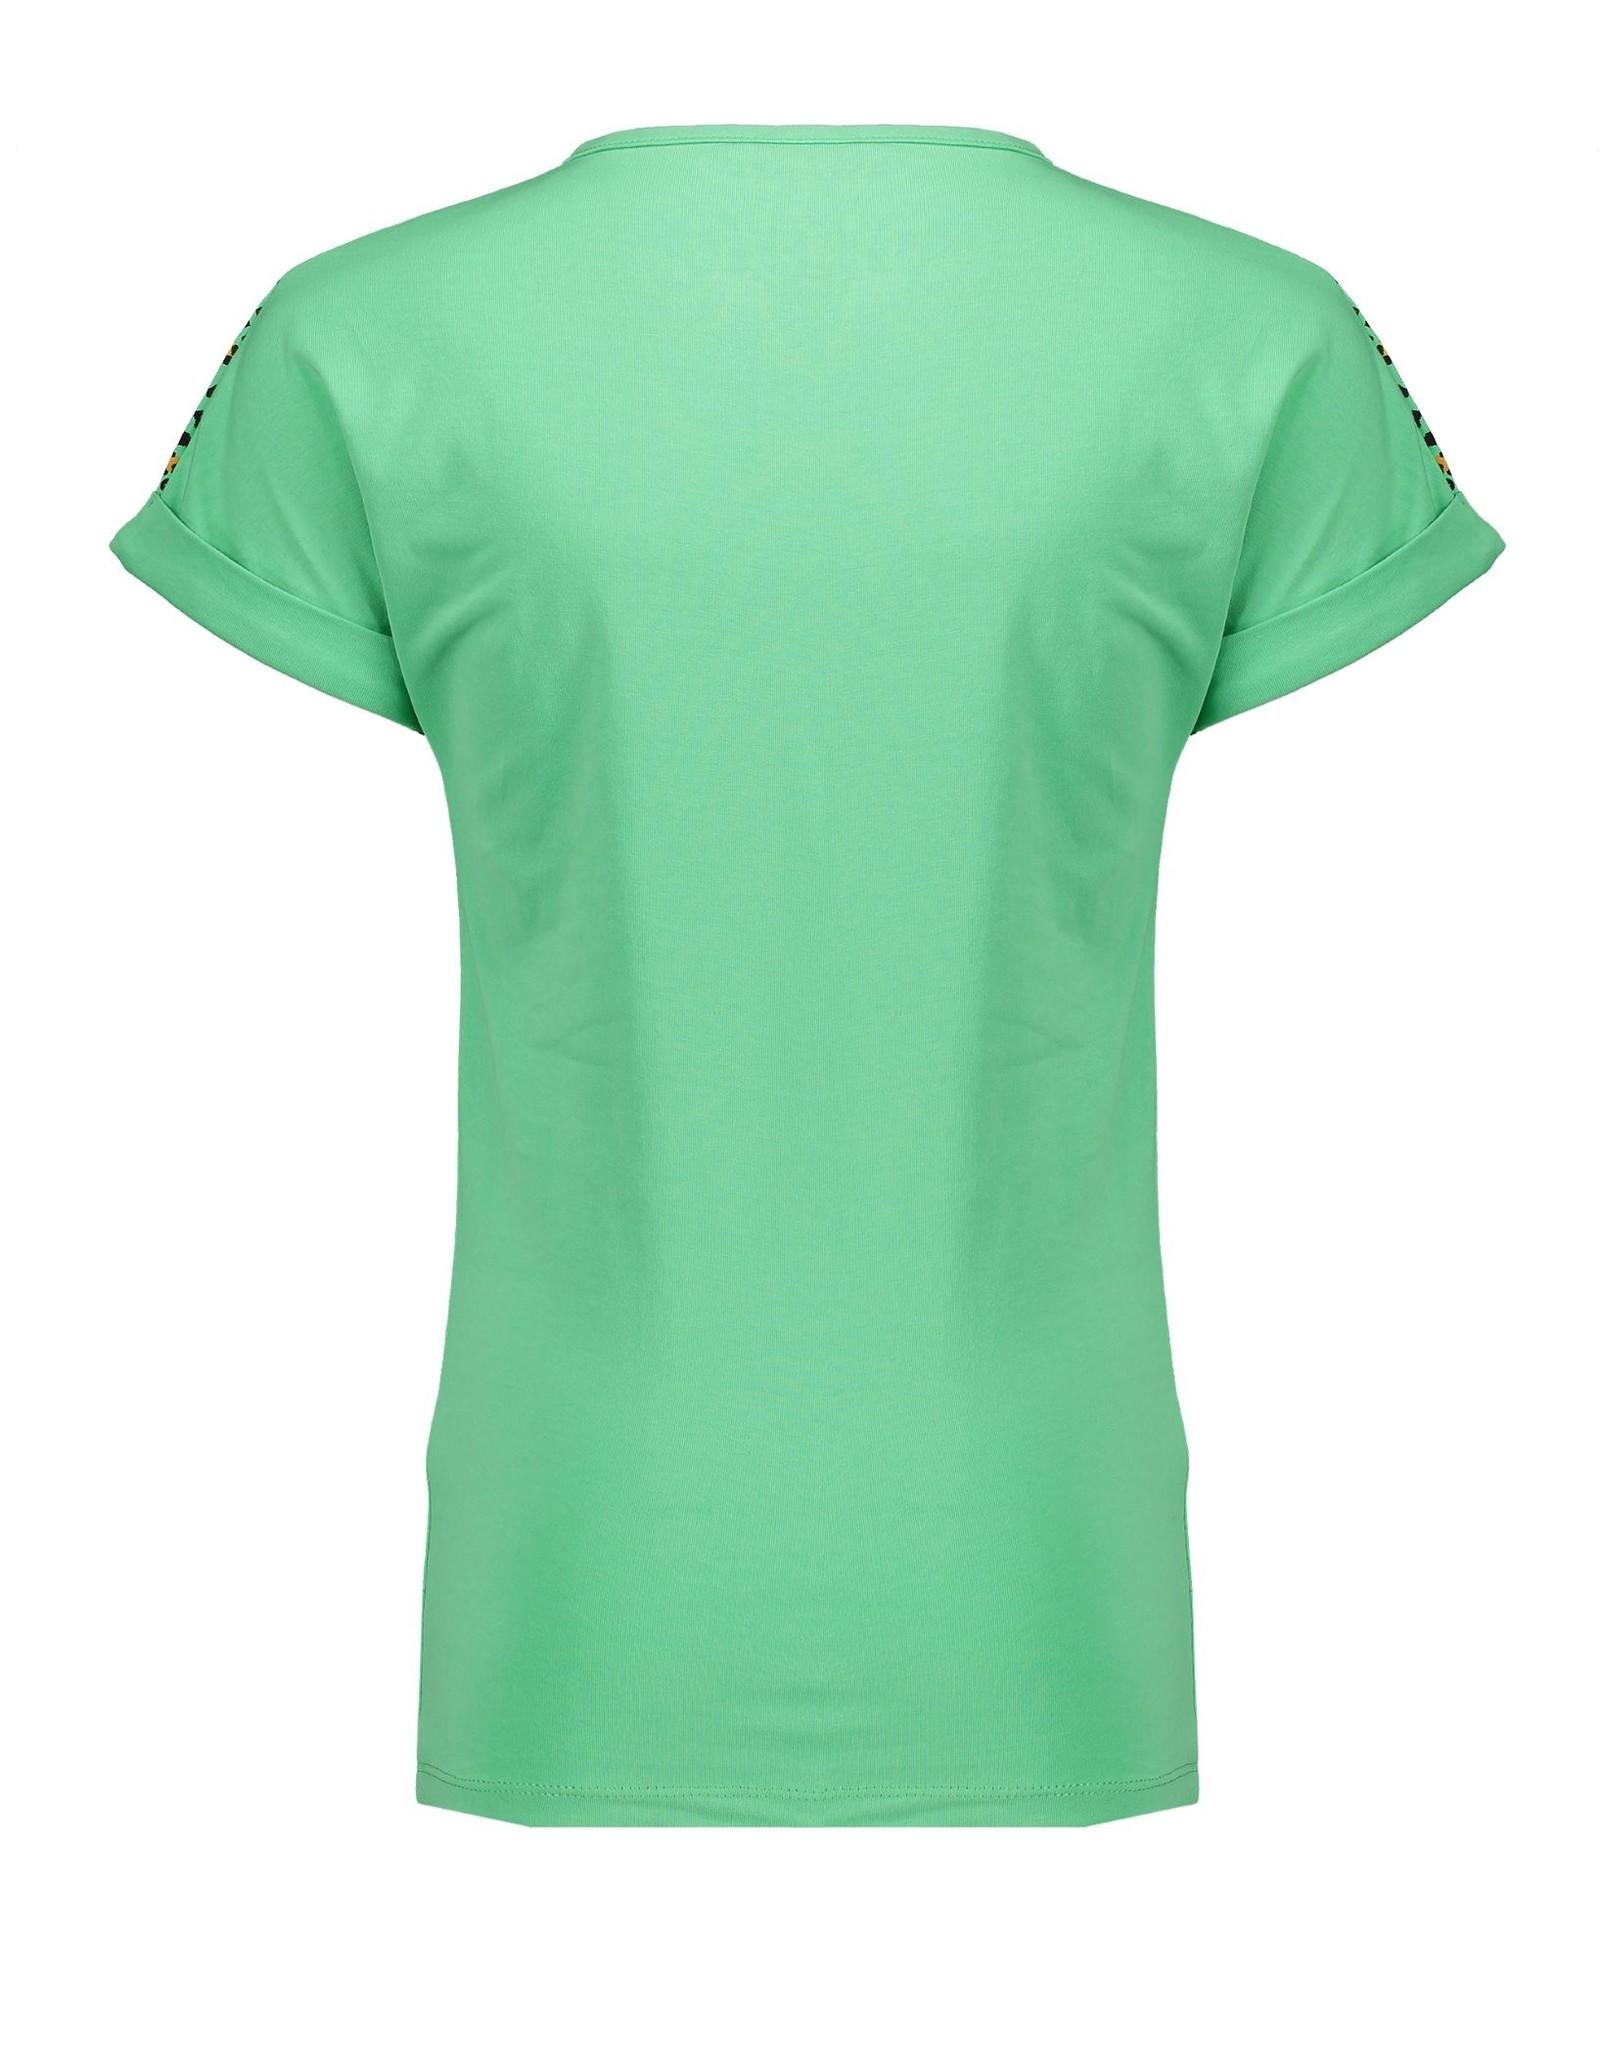 NoBell NoBell shirt 3408 Copenhagen